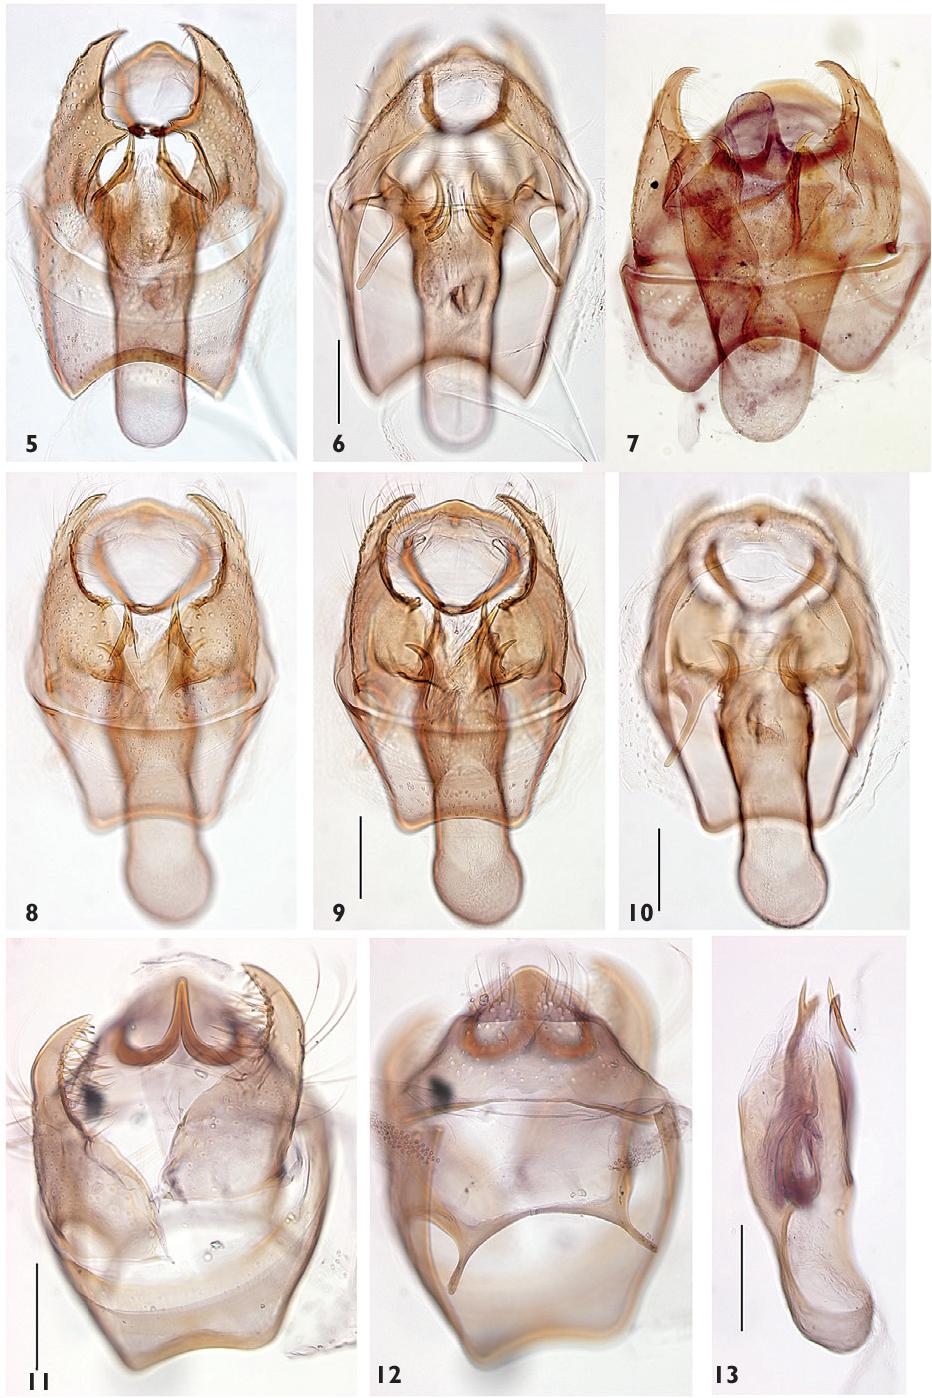 figure 5–13